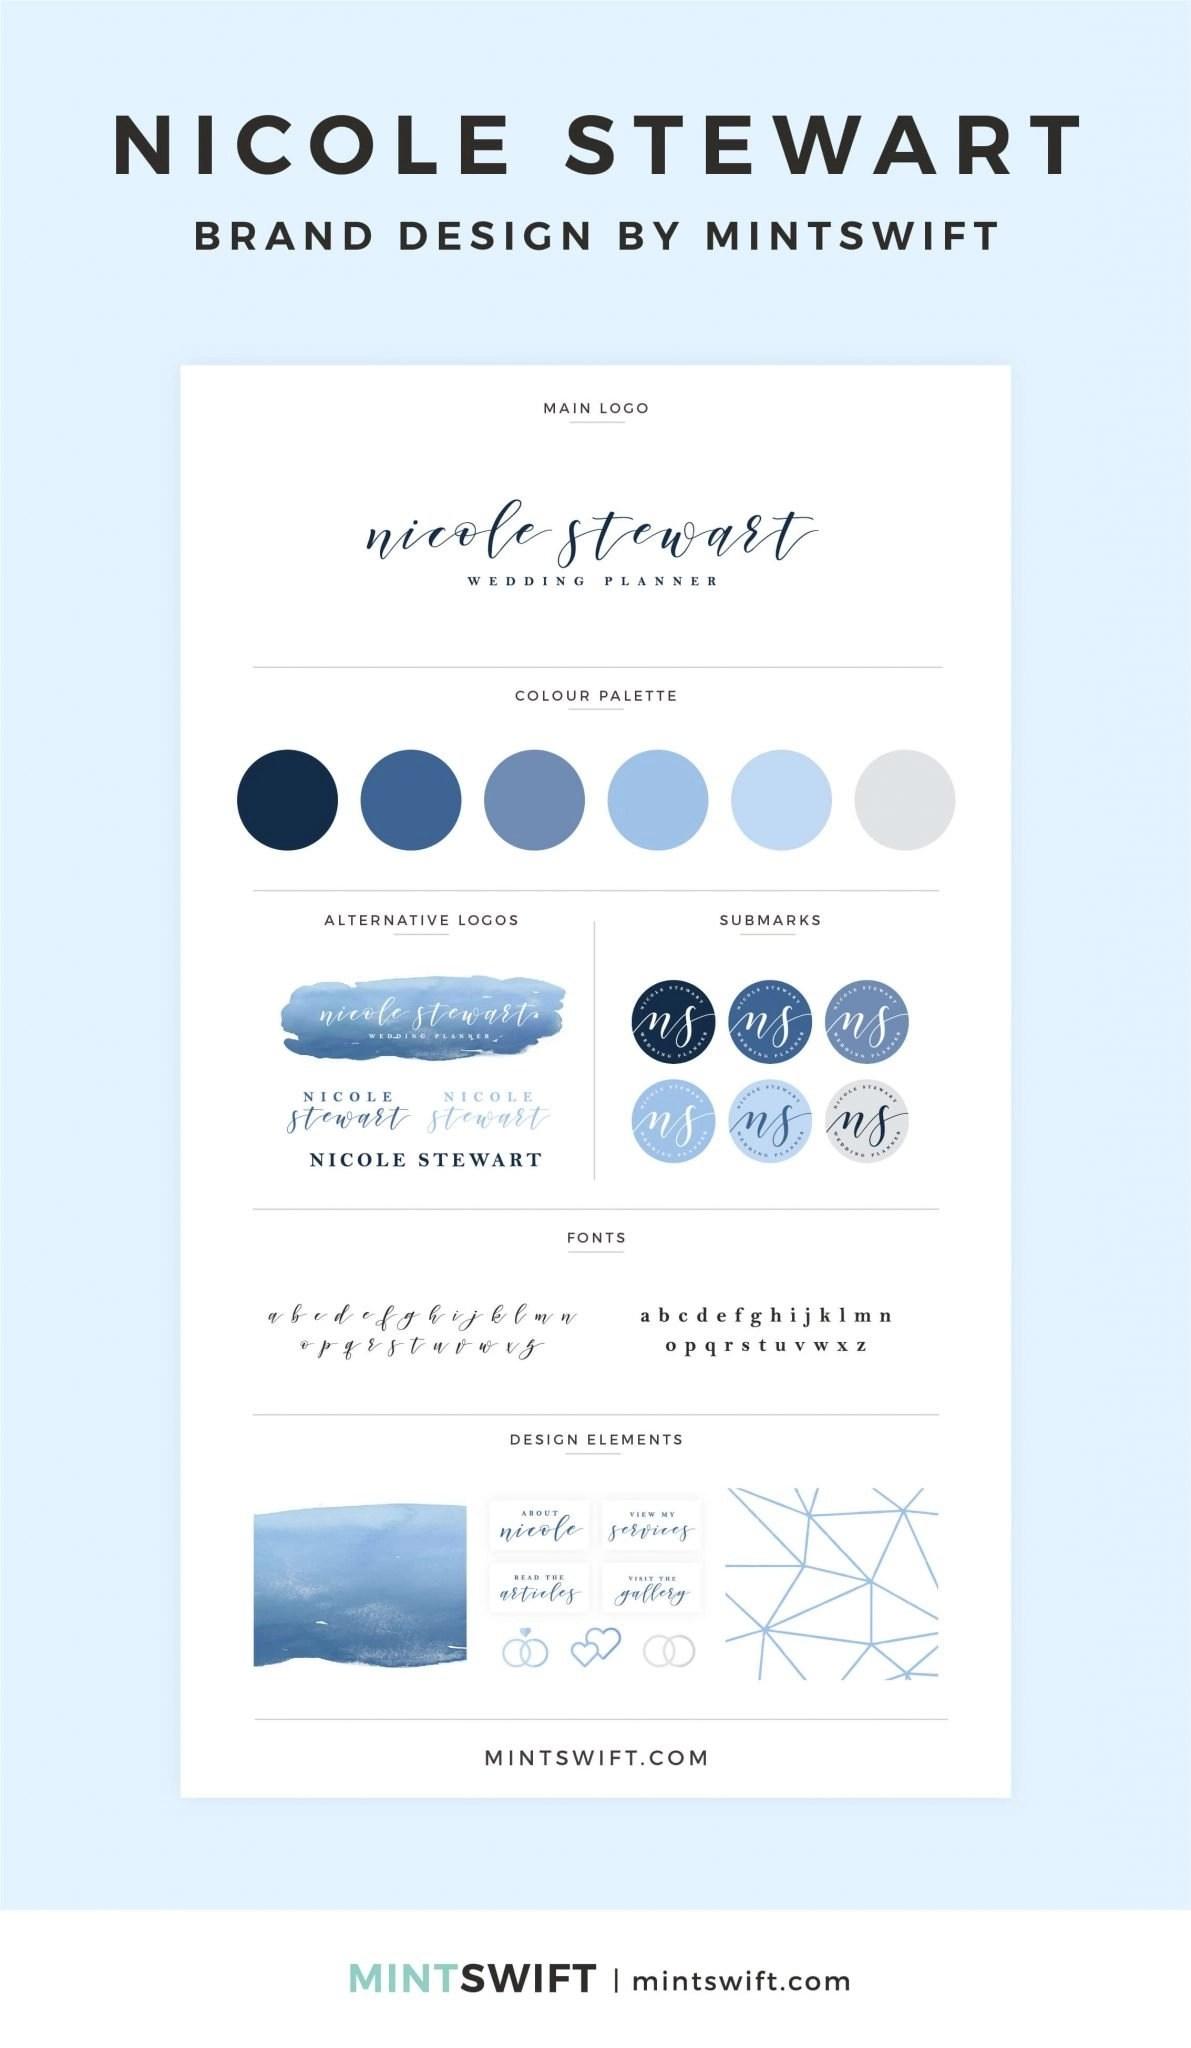 Nicole Stewart - Brand Design - MintSwift - Adrianna Leszczynska